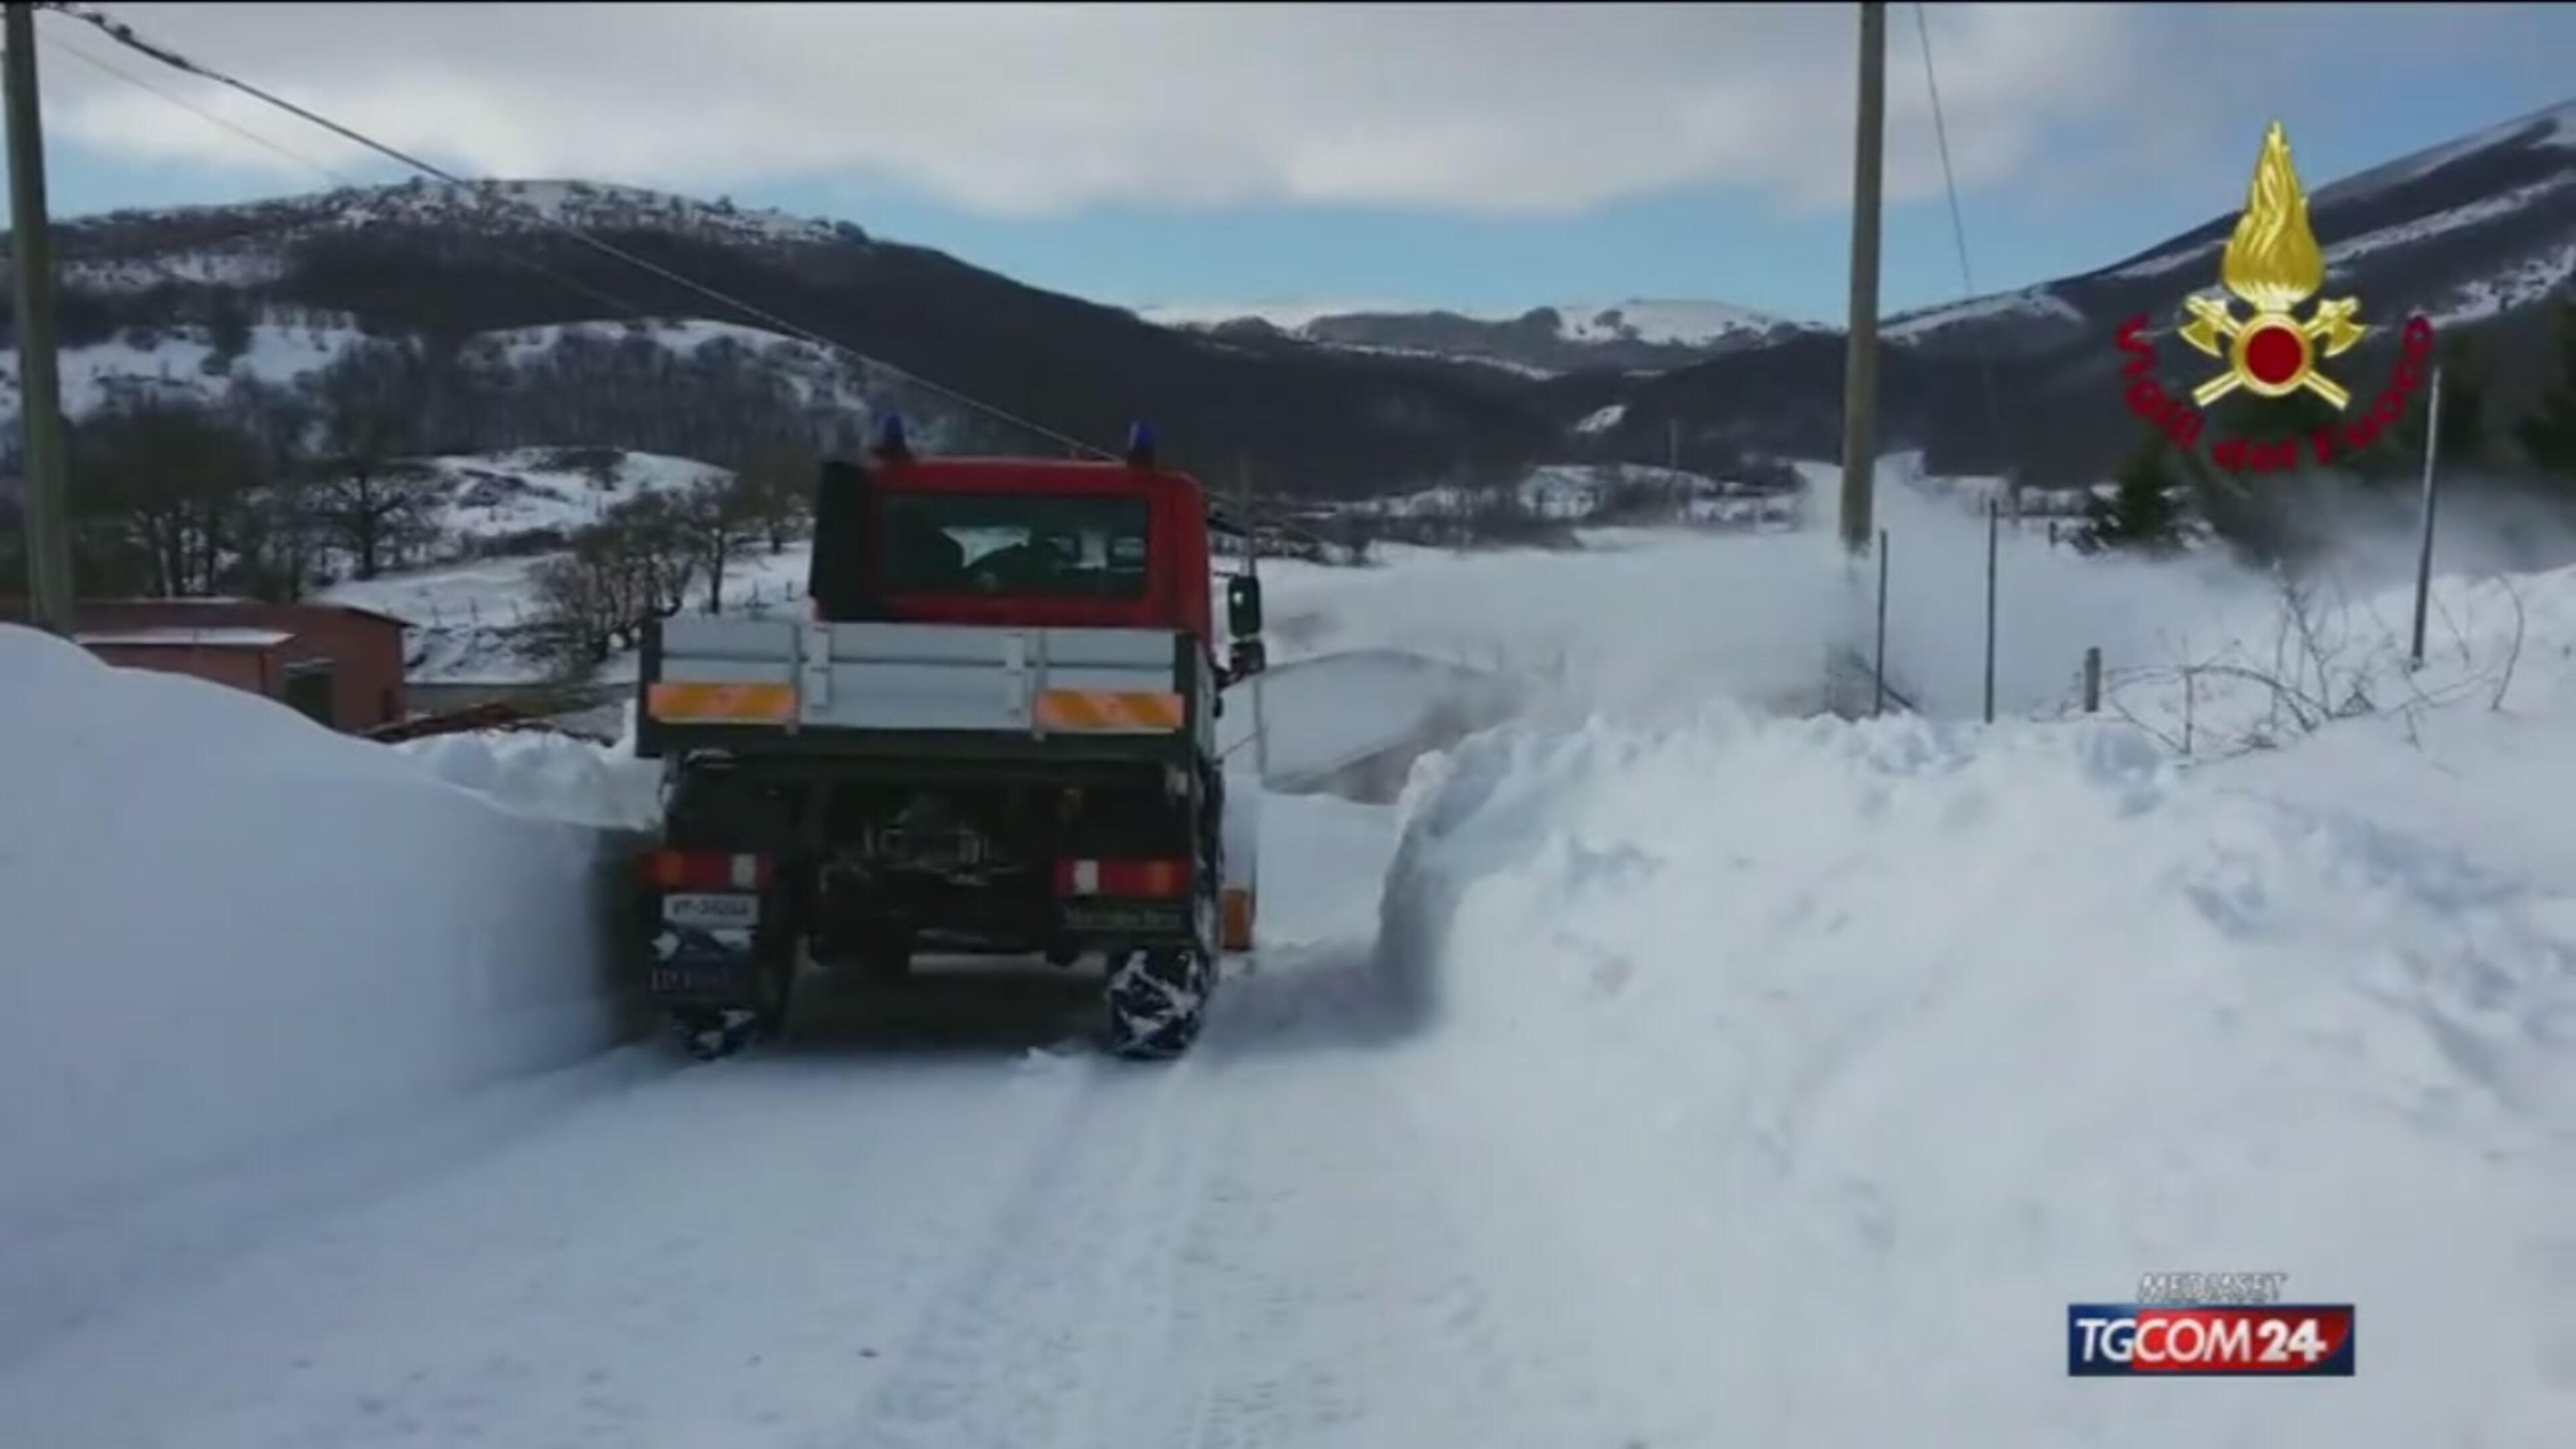 Gelo e neve sui terremotati e in Sud Italia